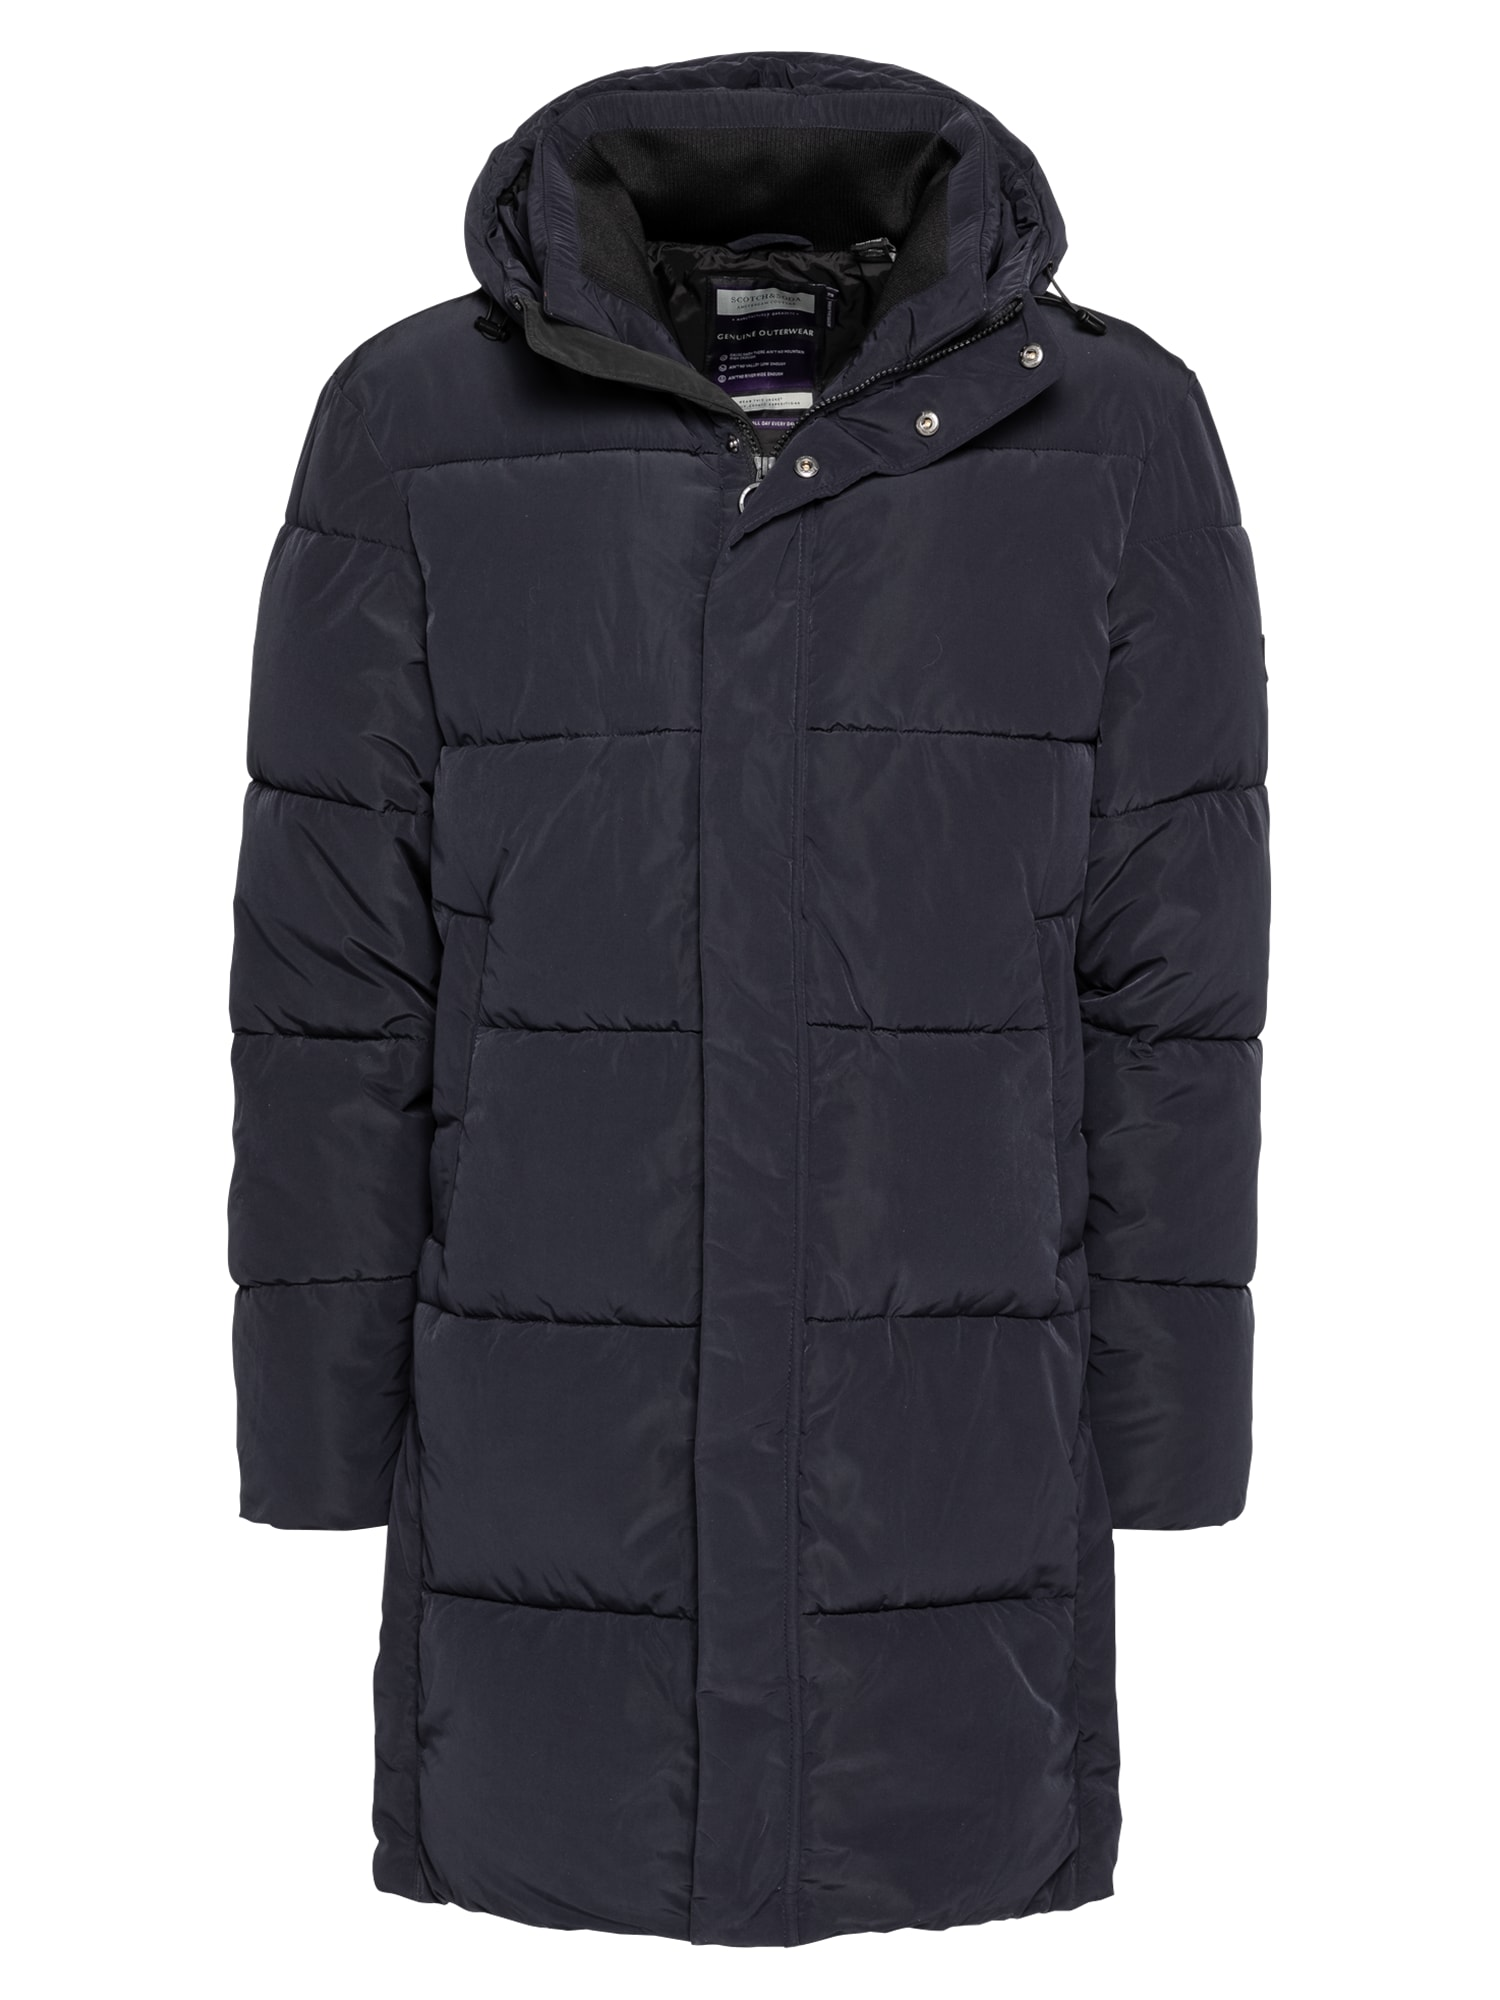 SCOTCH & SODA Žieminis paltas nakties mėlyna